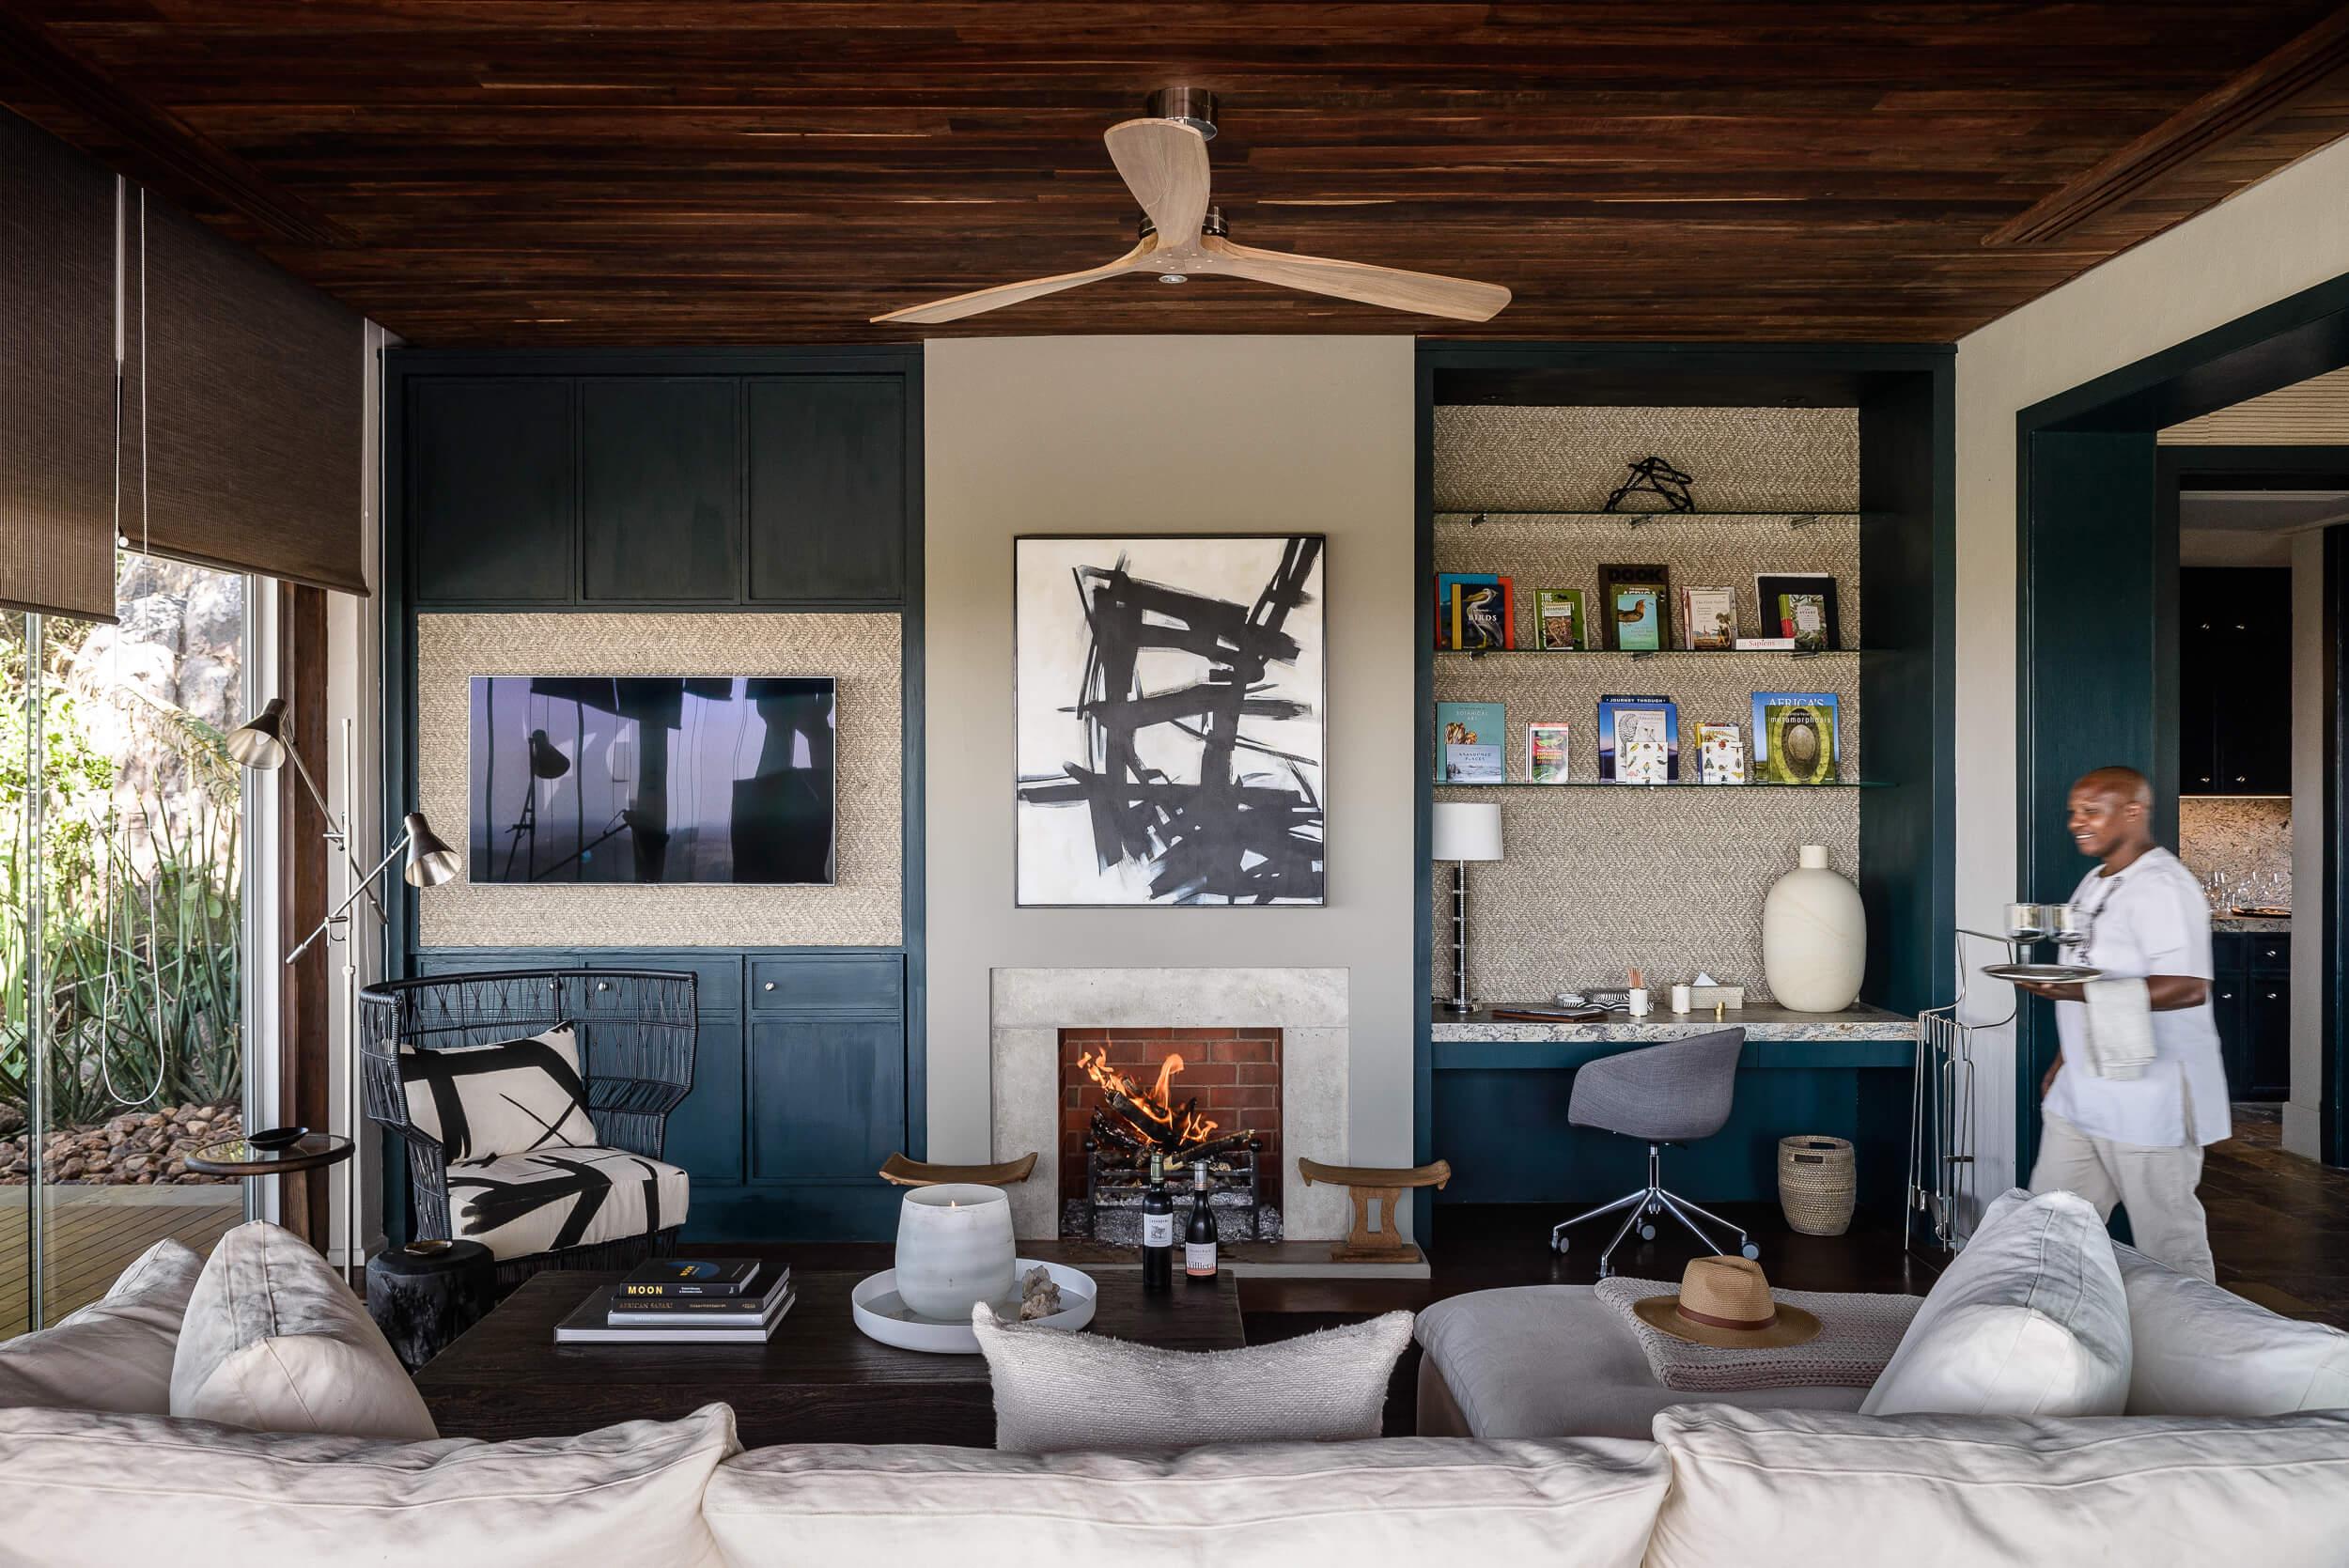 Hillside-Suite-Singita-Sasakwa-Lodge-Lounge-Area-with-Fireplace-and-Staff.jpg